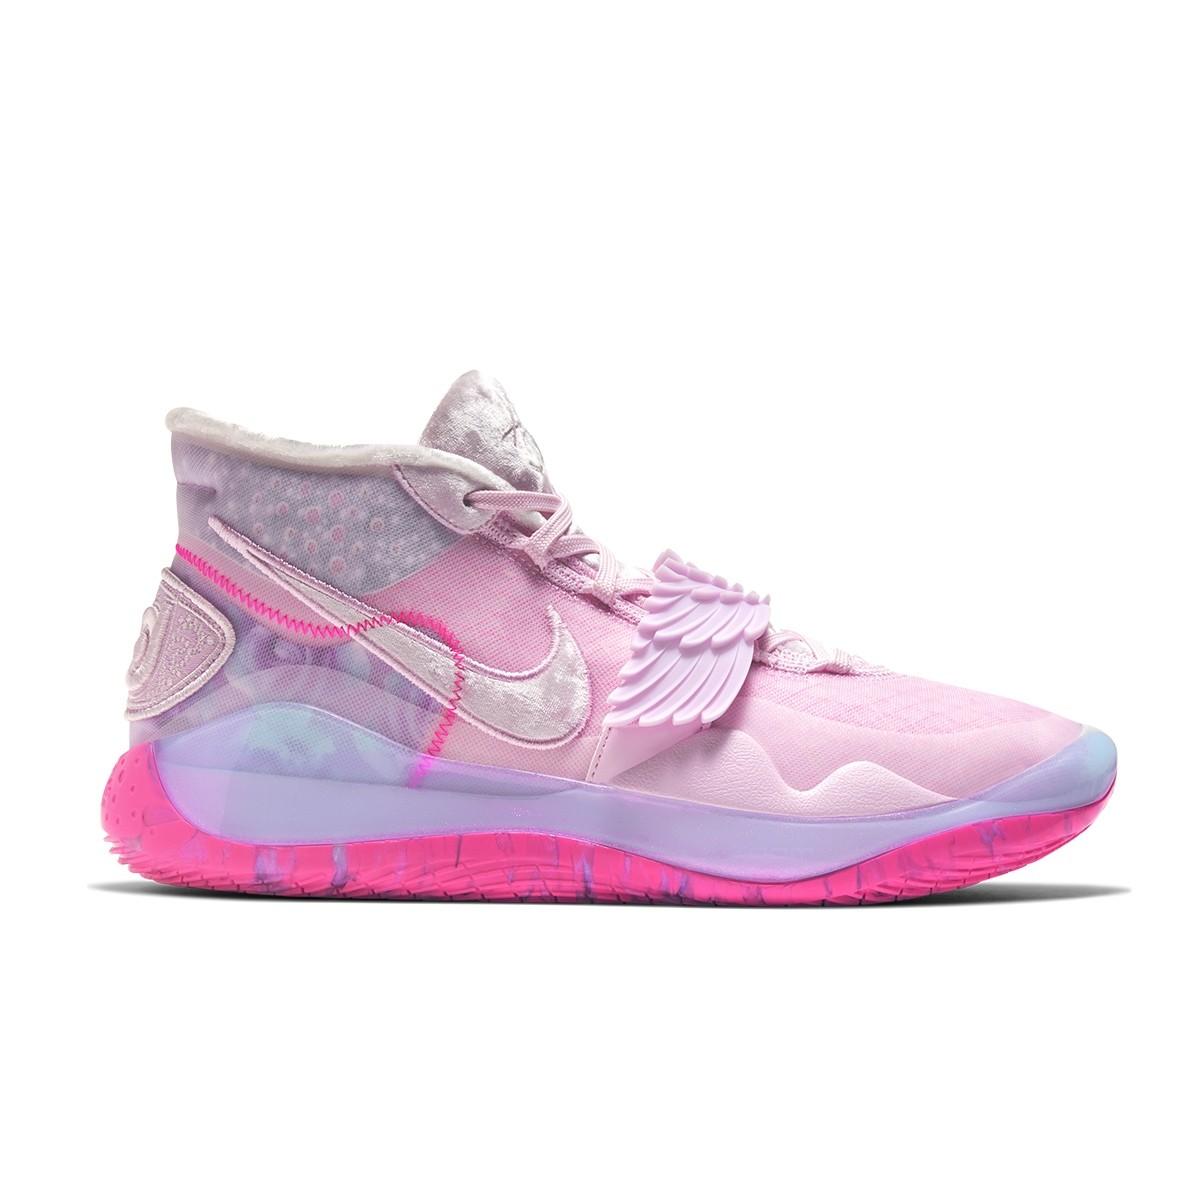 Nike Zoom KD 12 'Aunt Pearl'